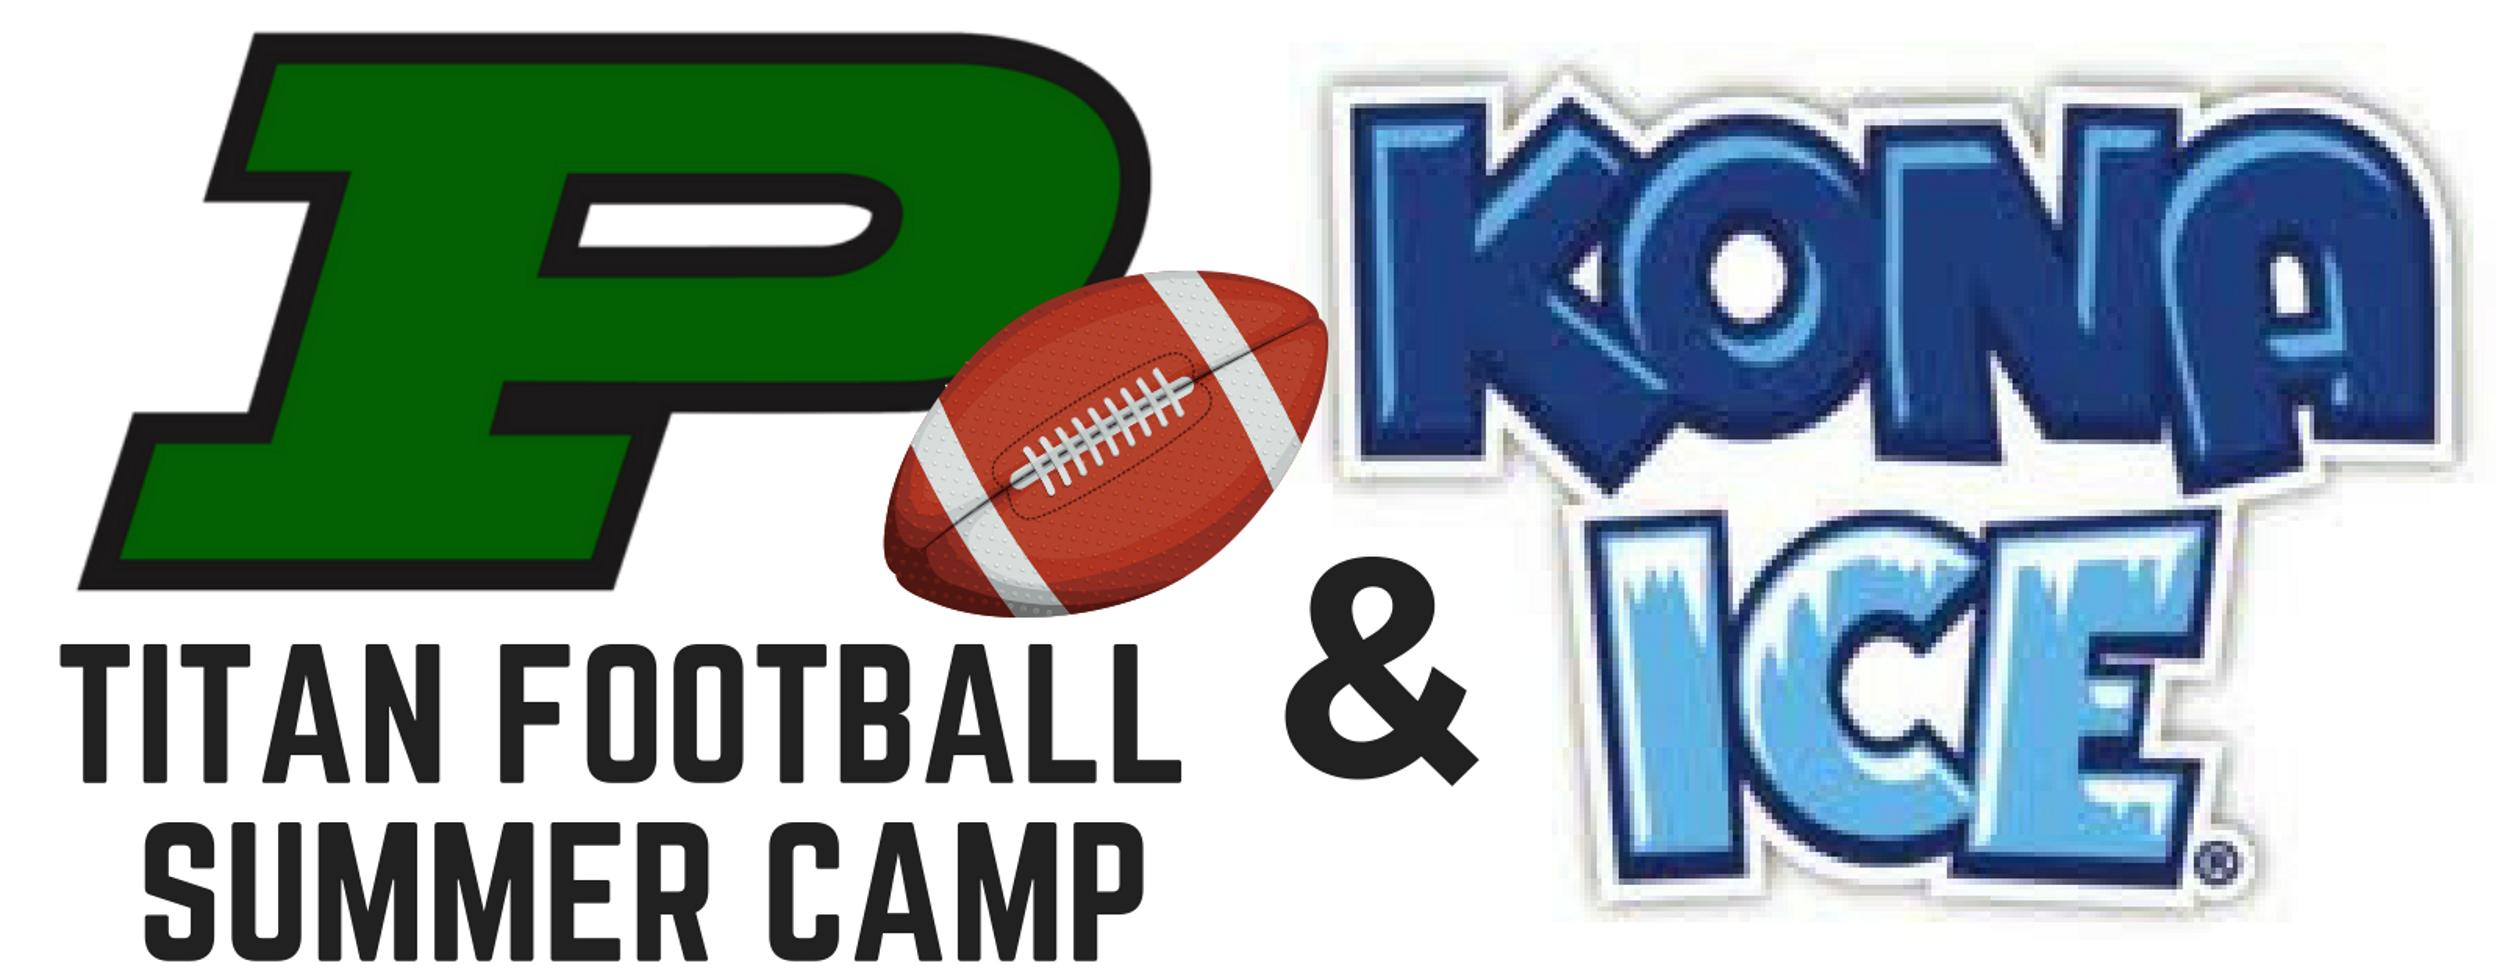 KONA ICE IS COMING! – Titan Football Camps